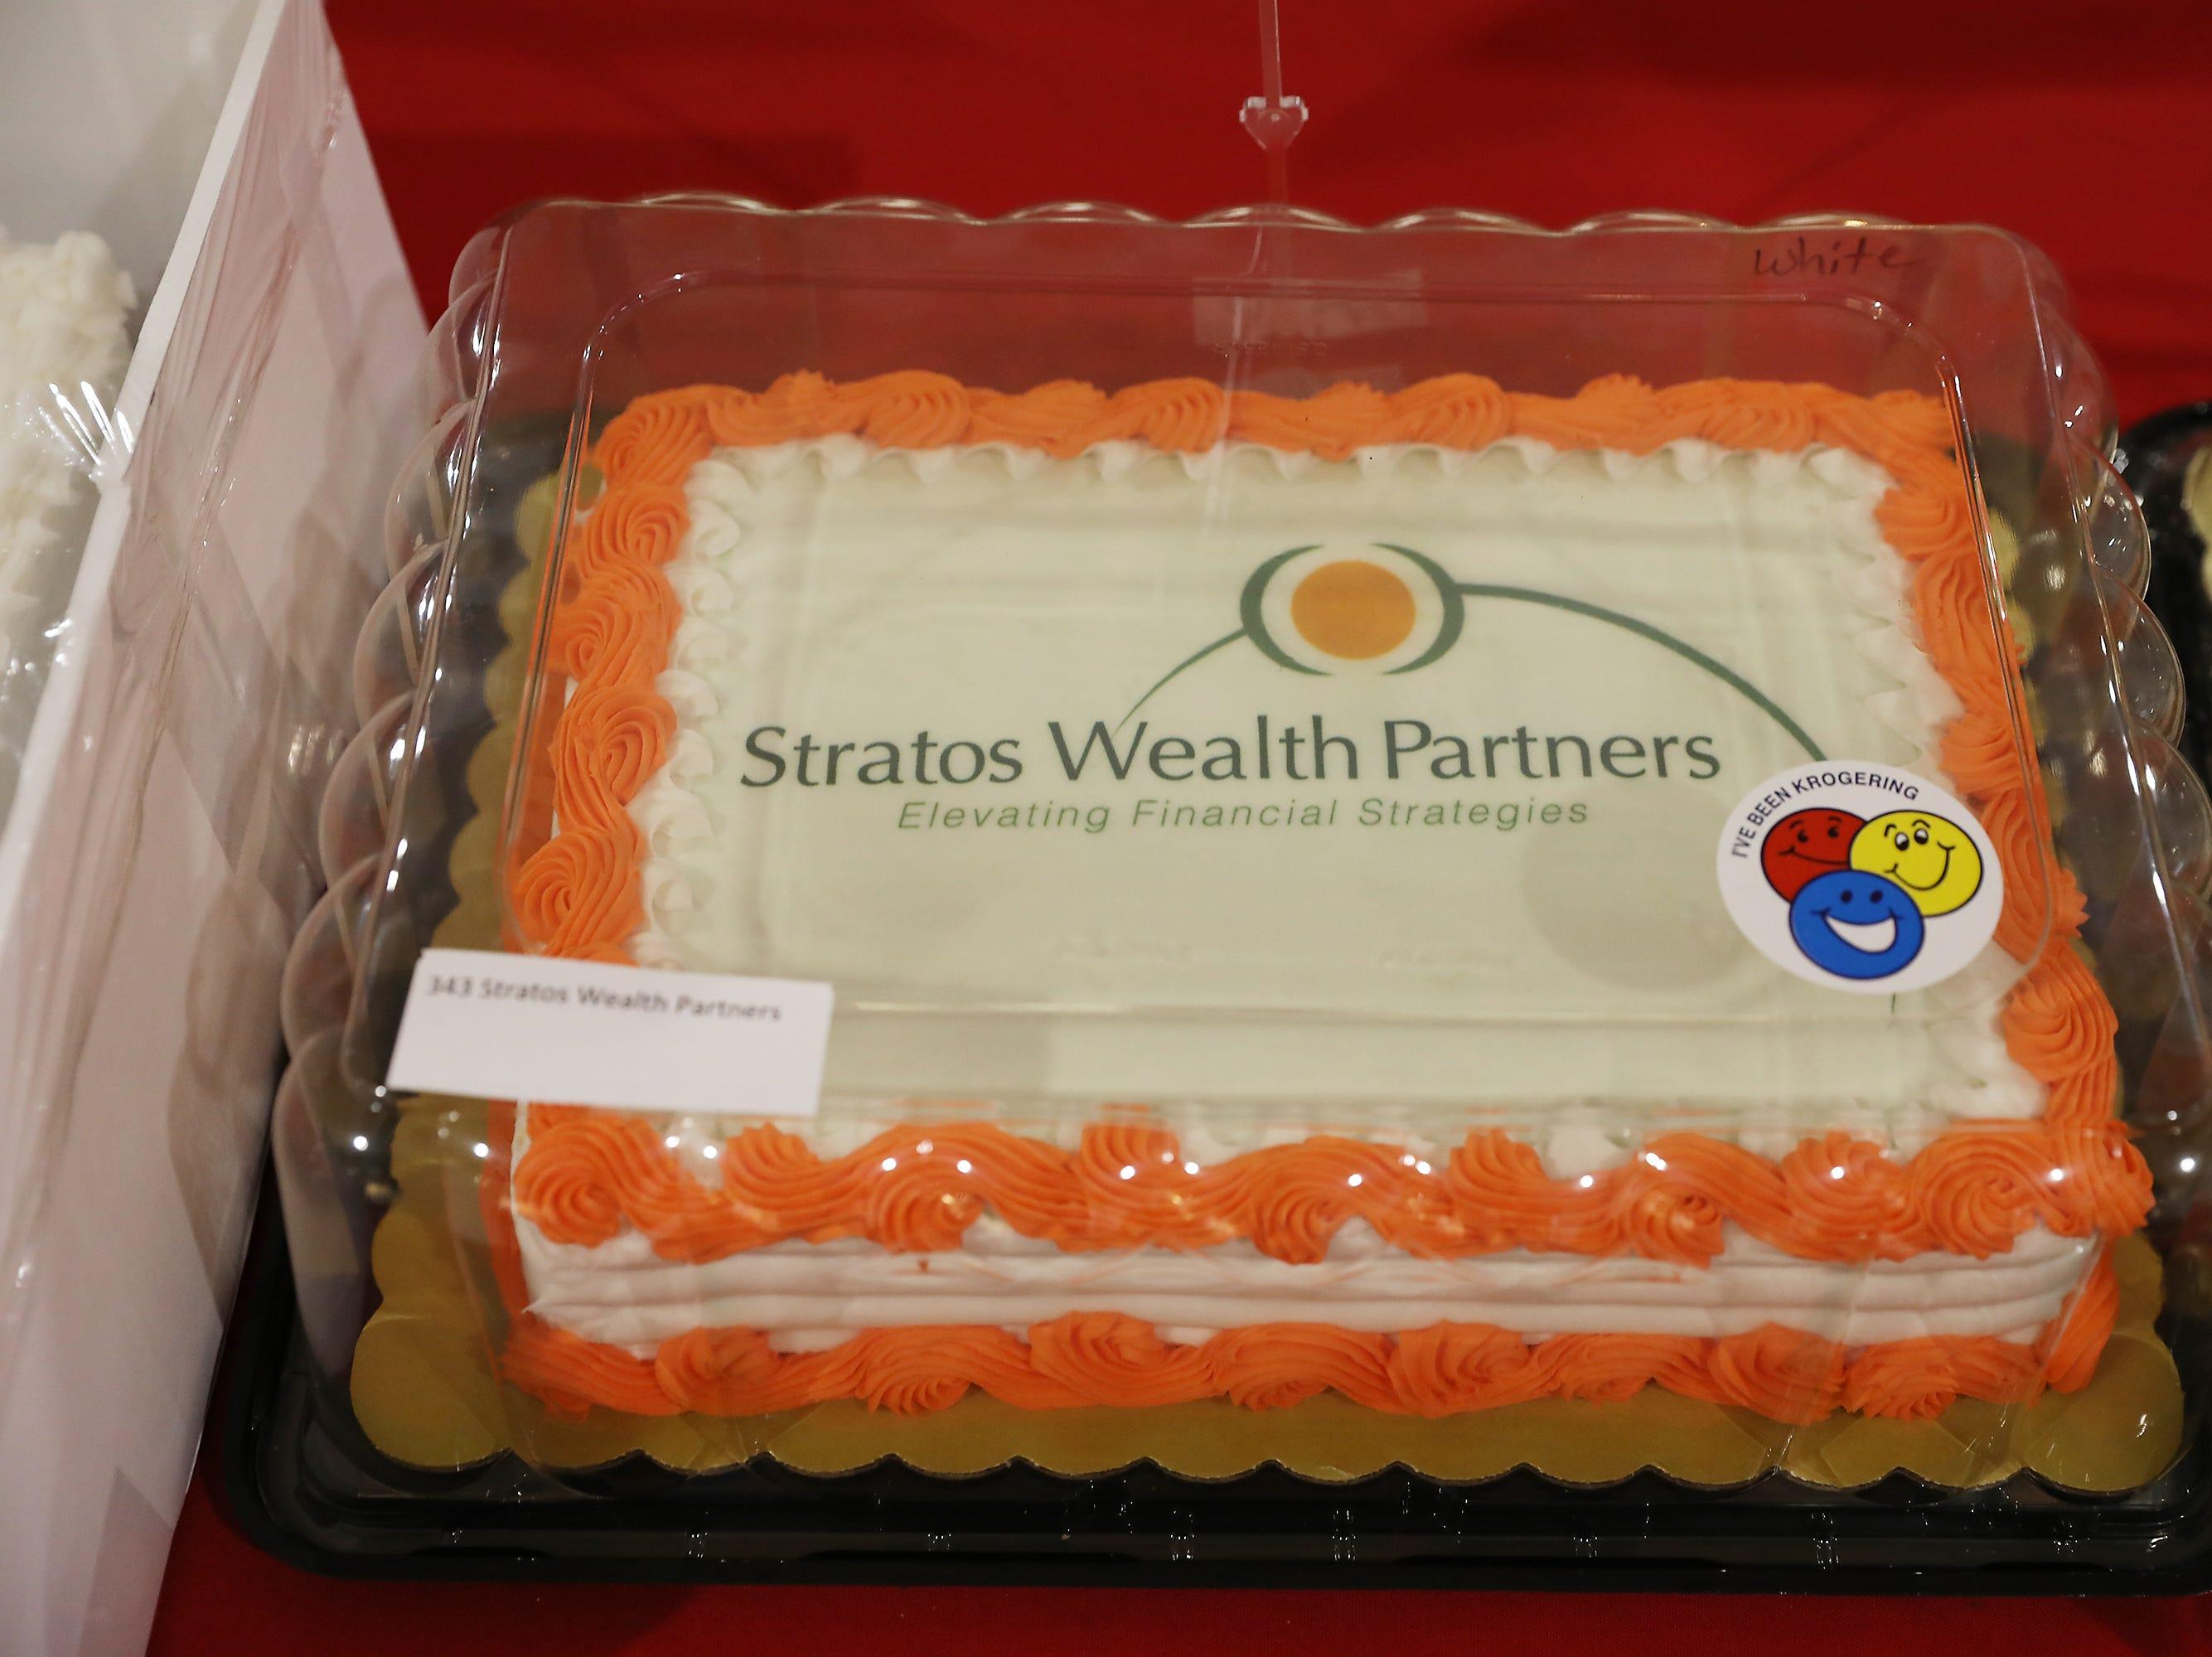 2:45 P.M. Friday cake 343 Stratos Wealth Partners - 2 tickets to Luke Bryan June 7 in Burgettstown, PA; $200